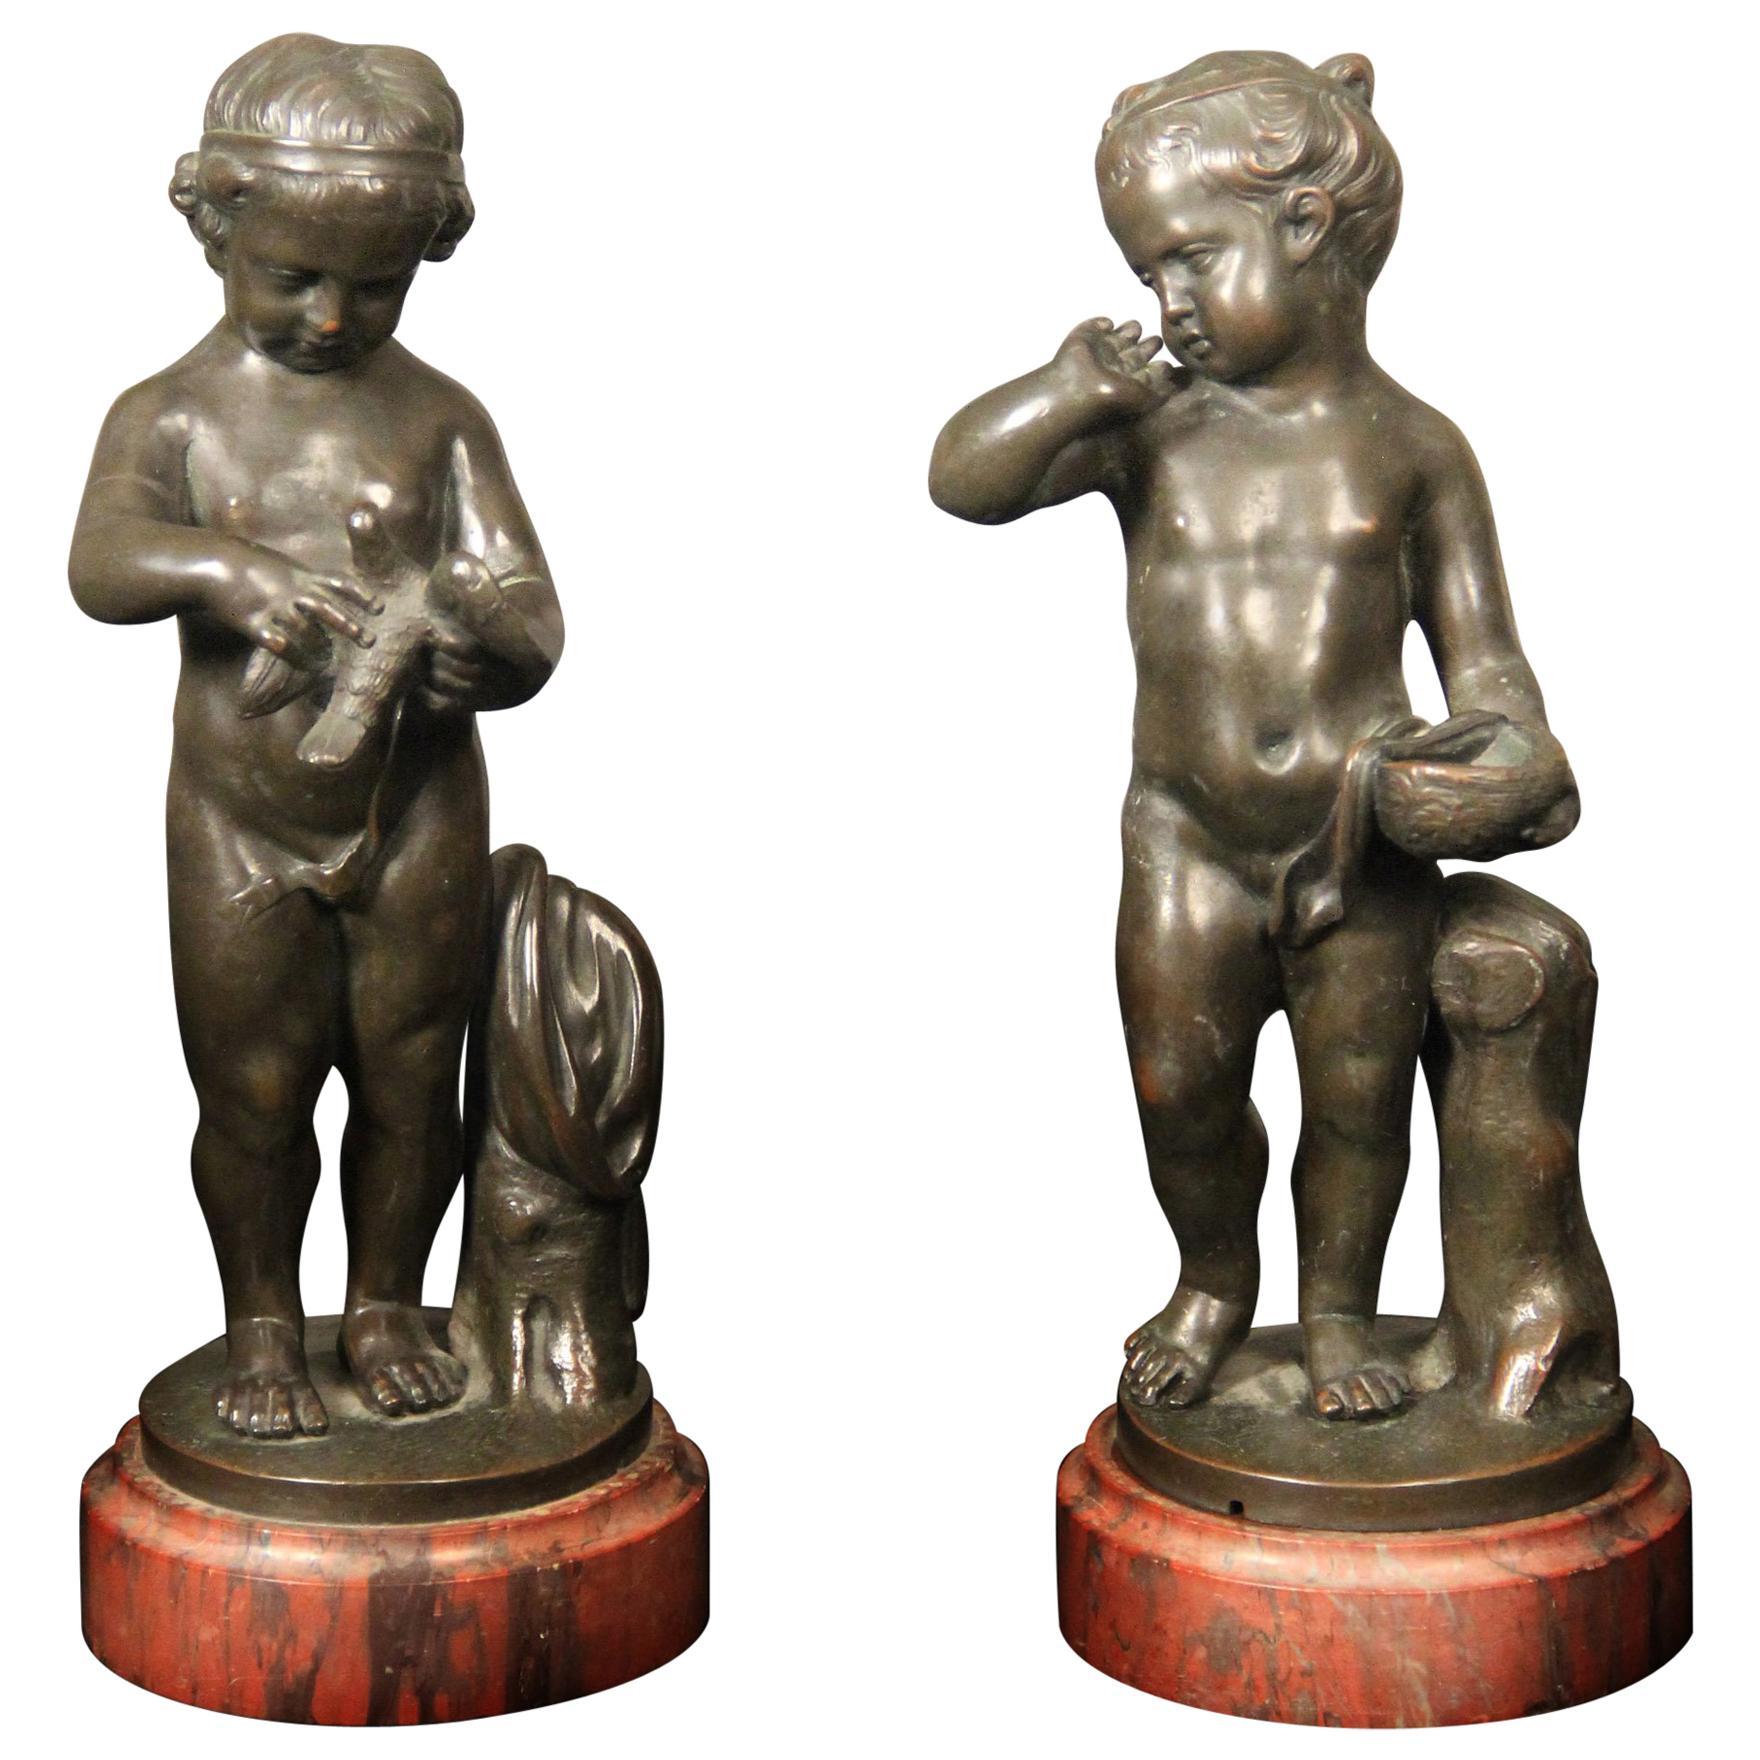 Pair of Late 19th Century Bronze Figurative Sculptures